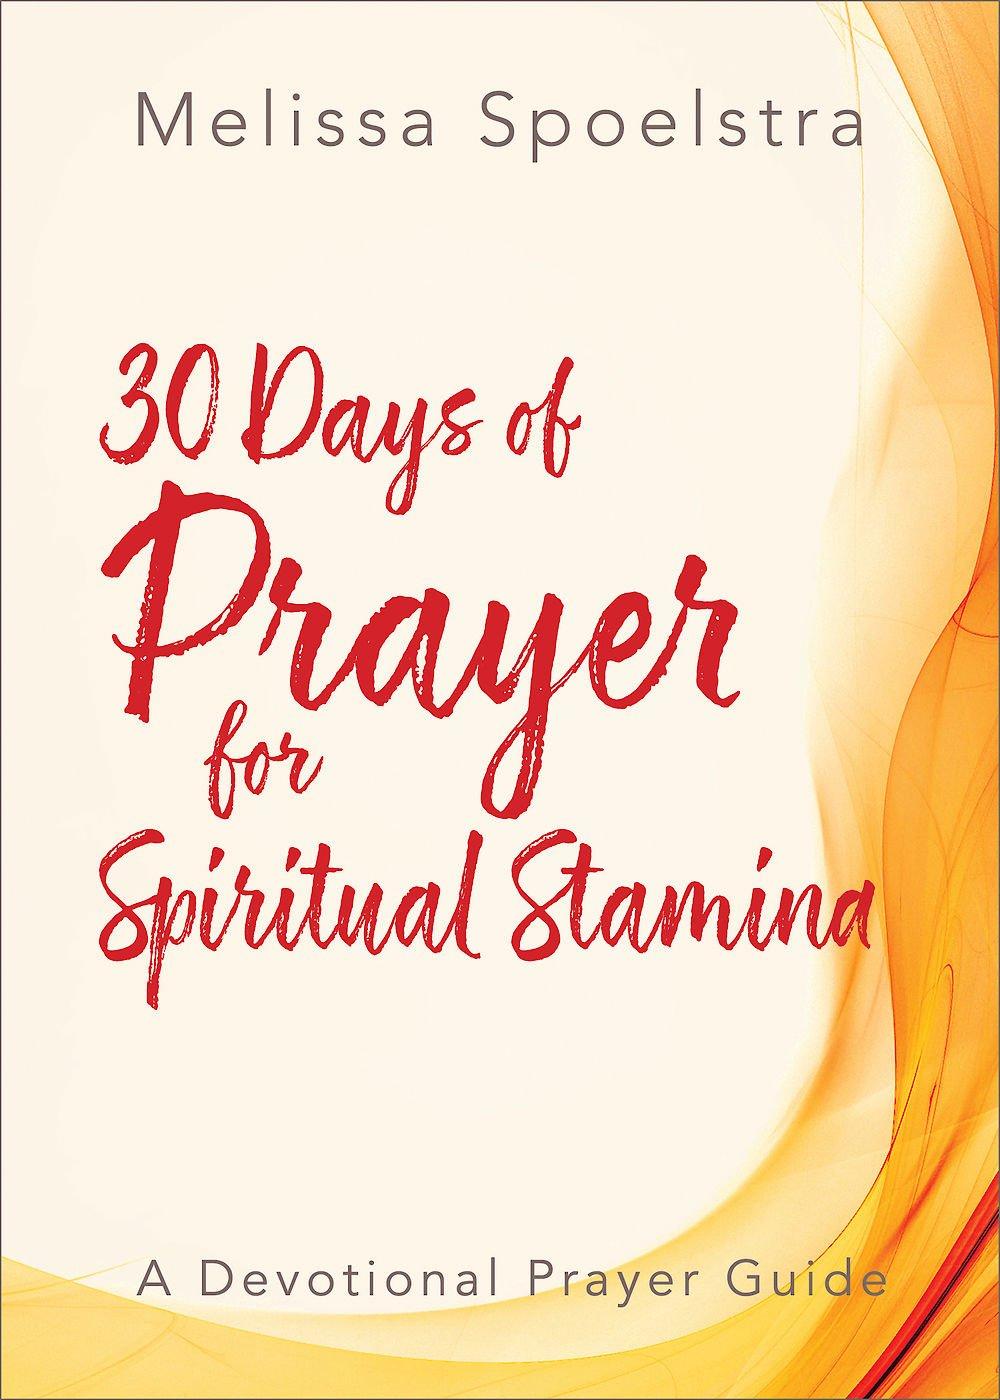 30 Days of Prayer for Spiritual Stamina: A Devotional Prayer